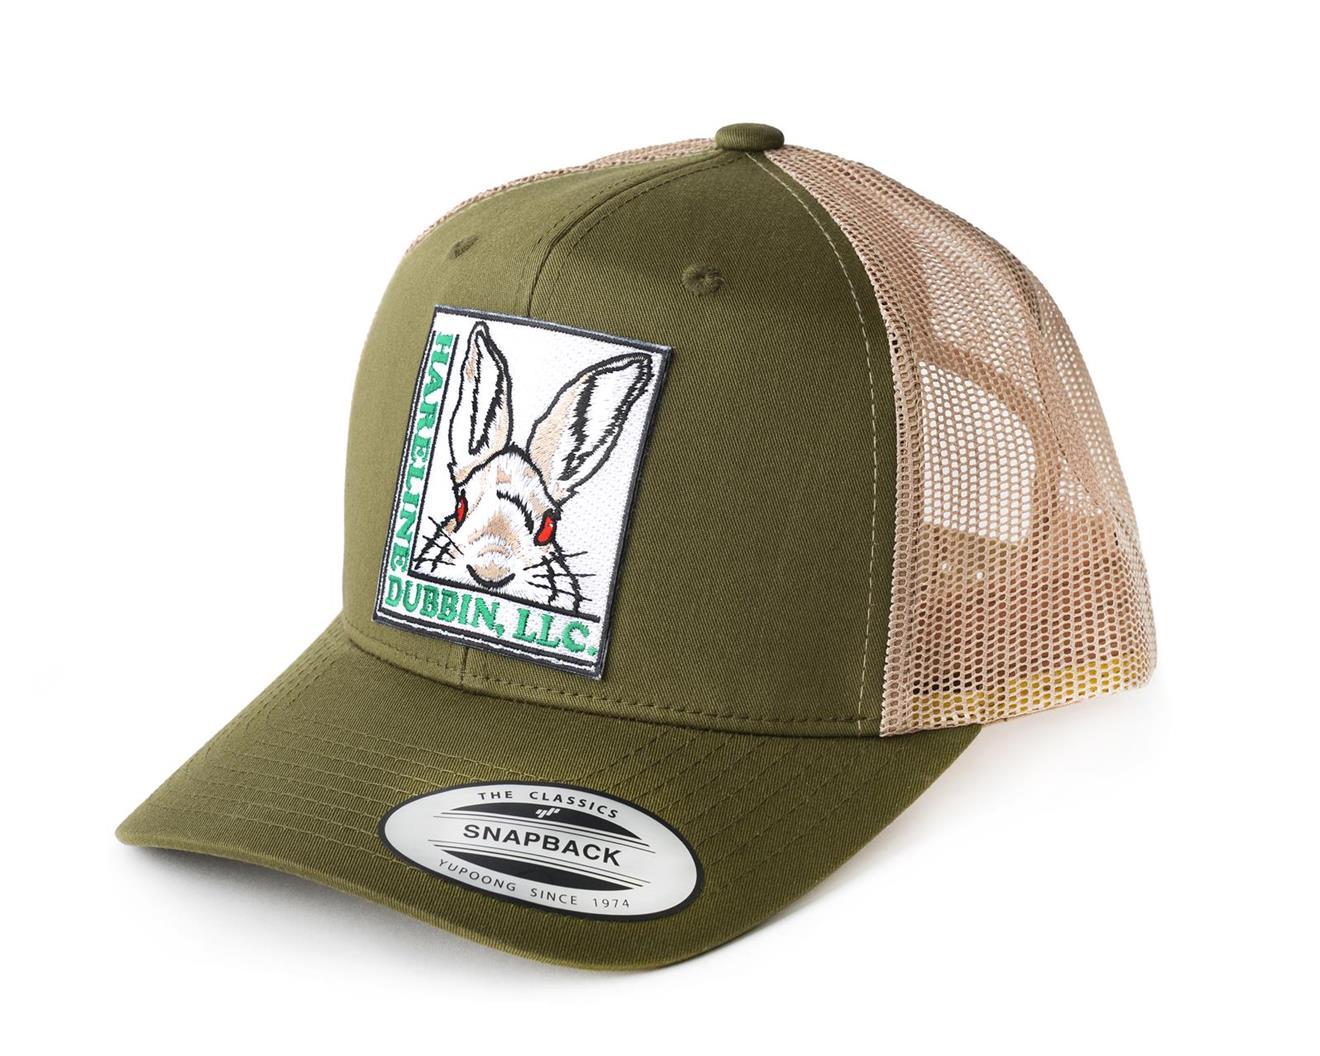 MOSS GREEN TRUCKER HARELINE CAP #1